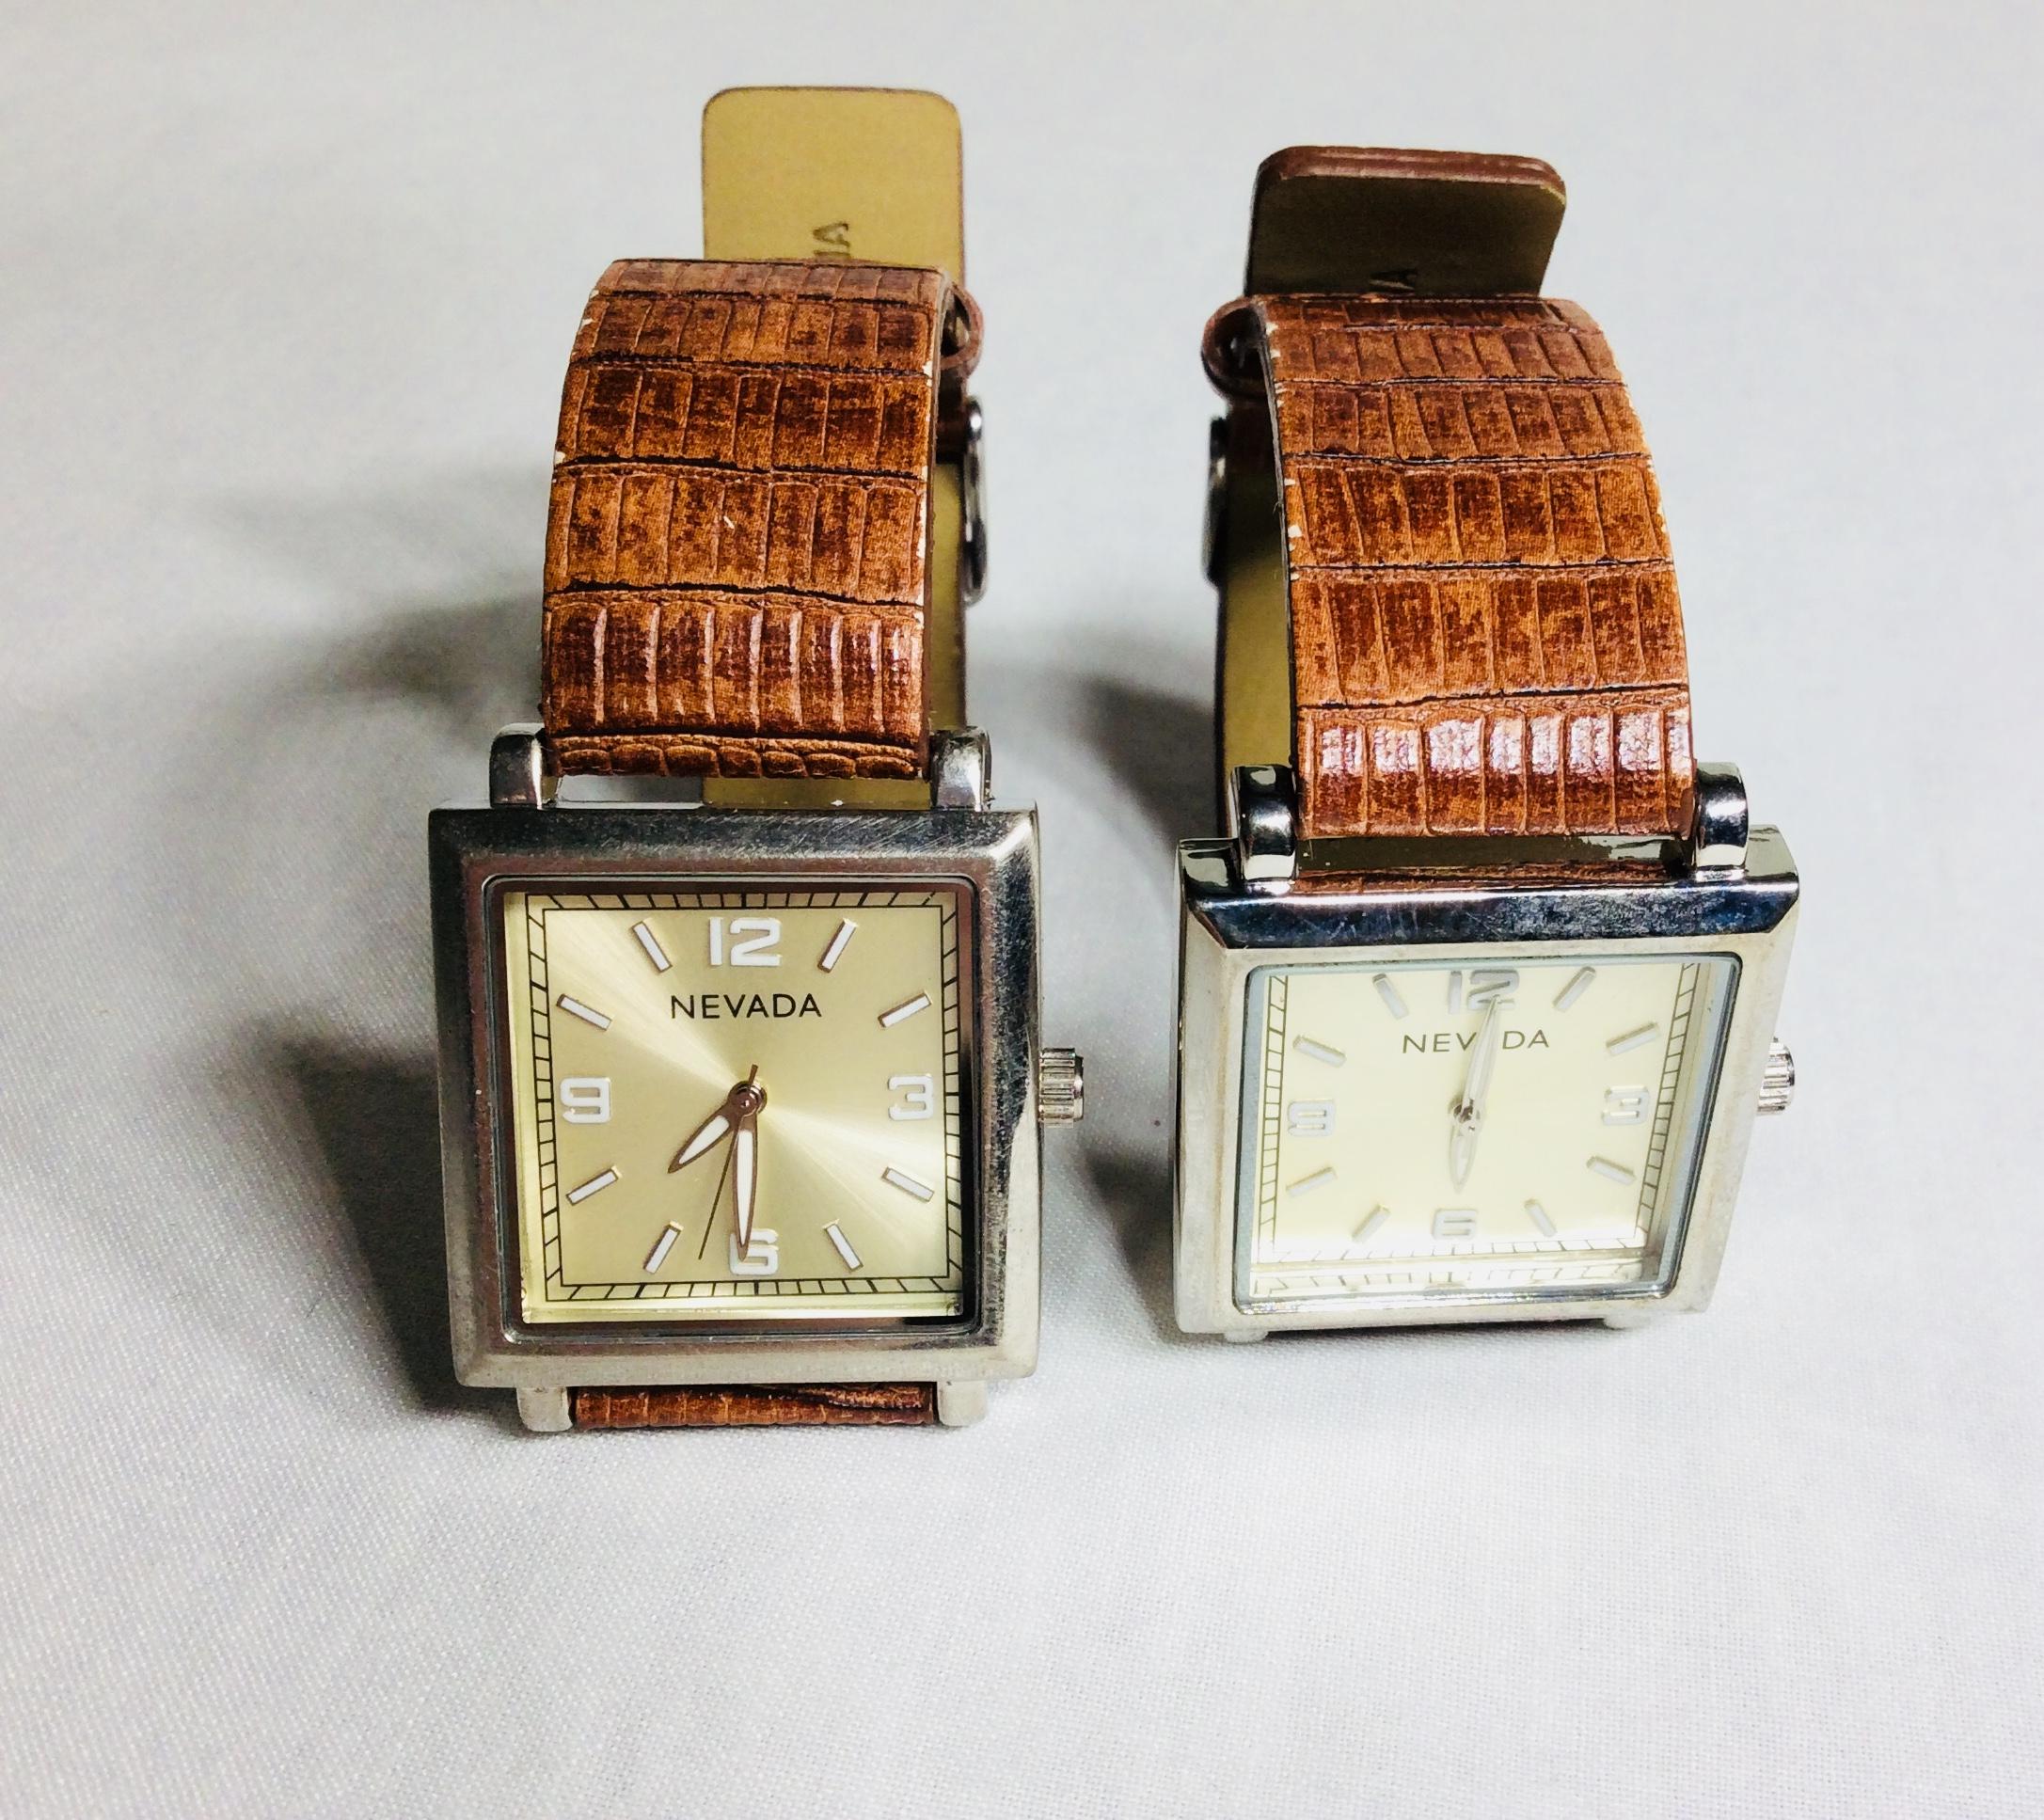 Nevada watch - Double